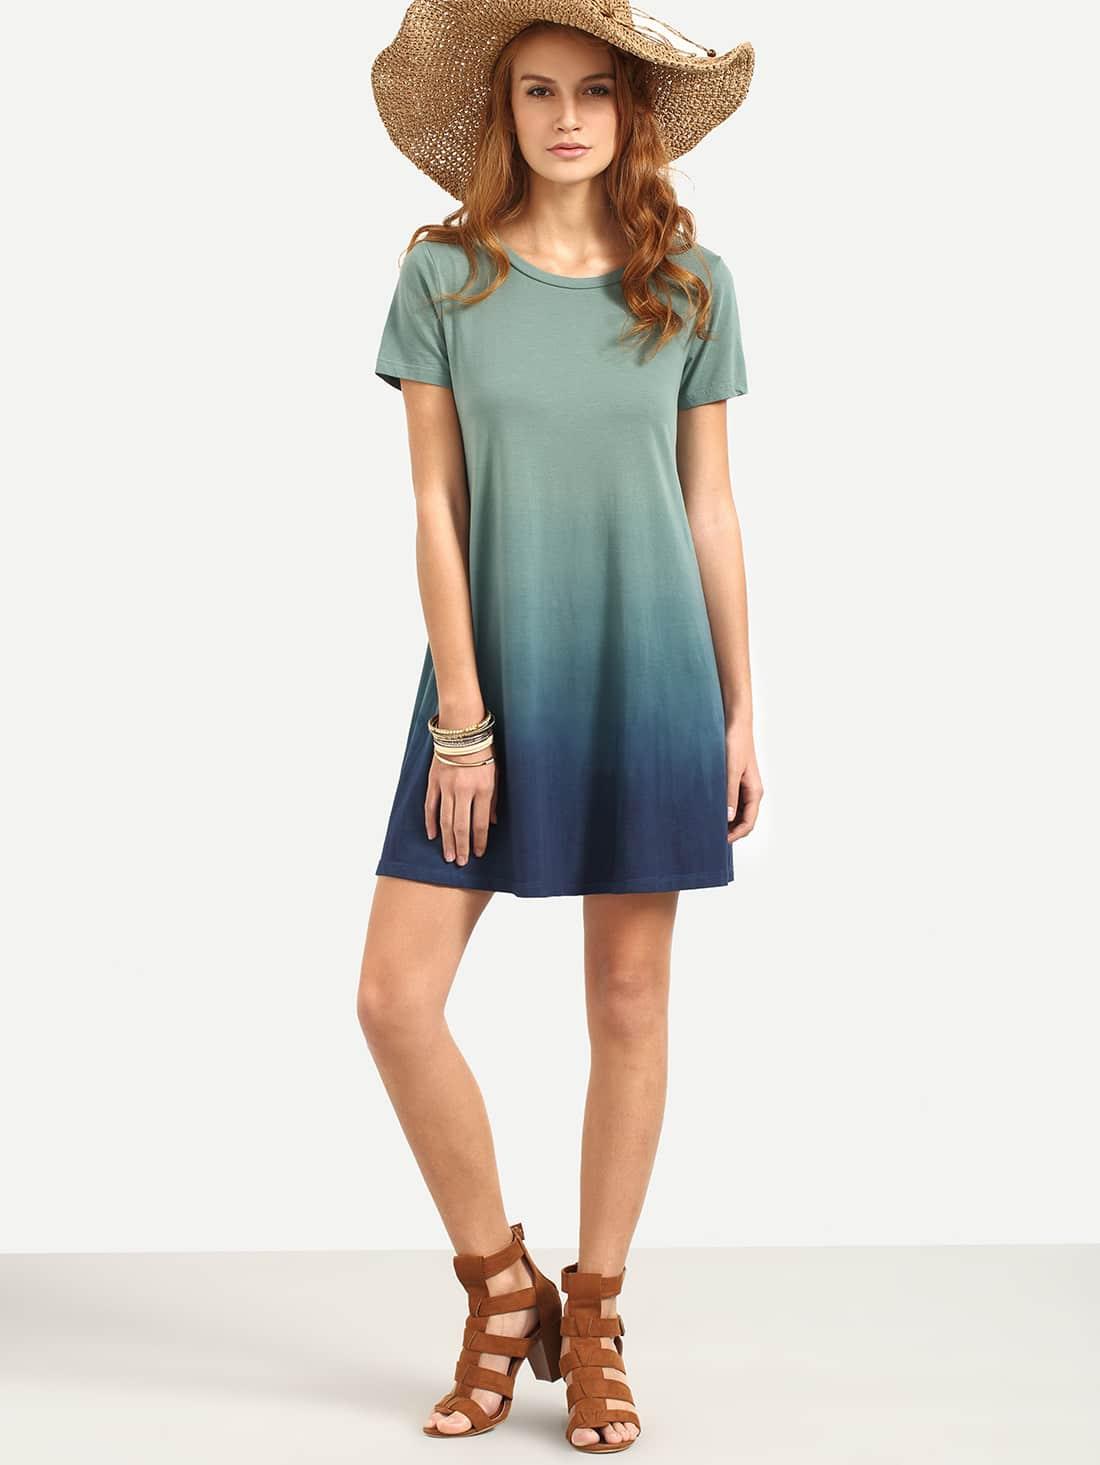 Ombre Tee Dress